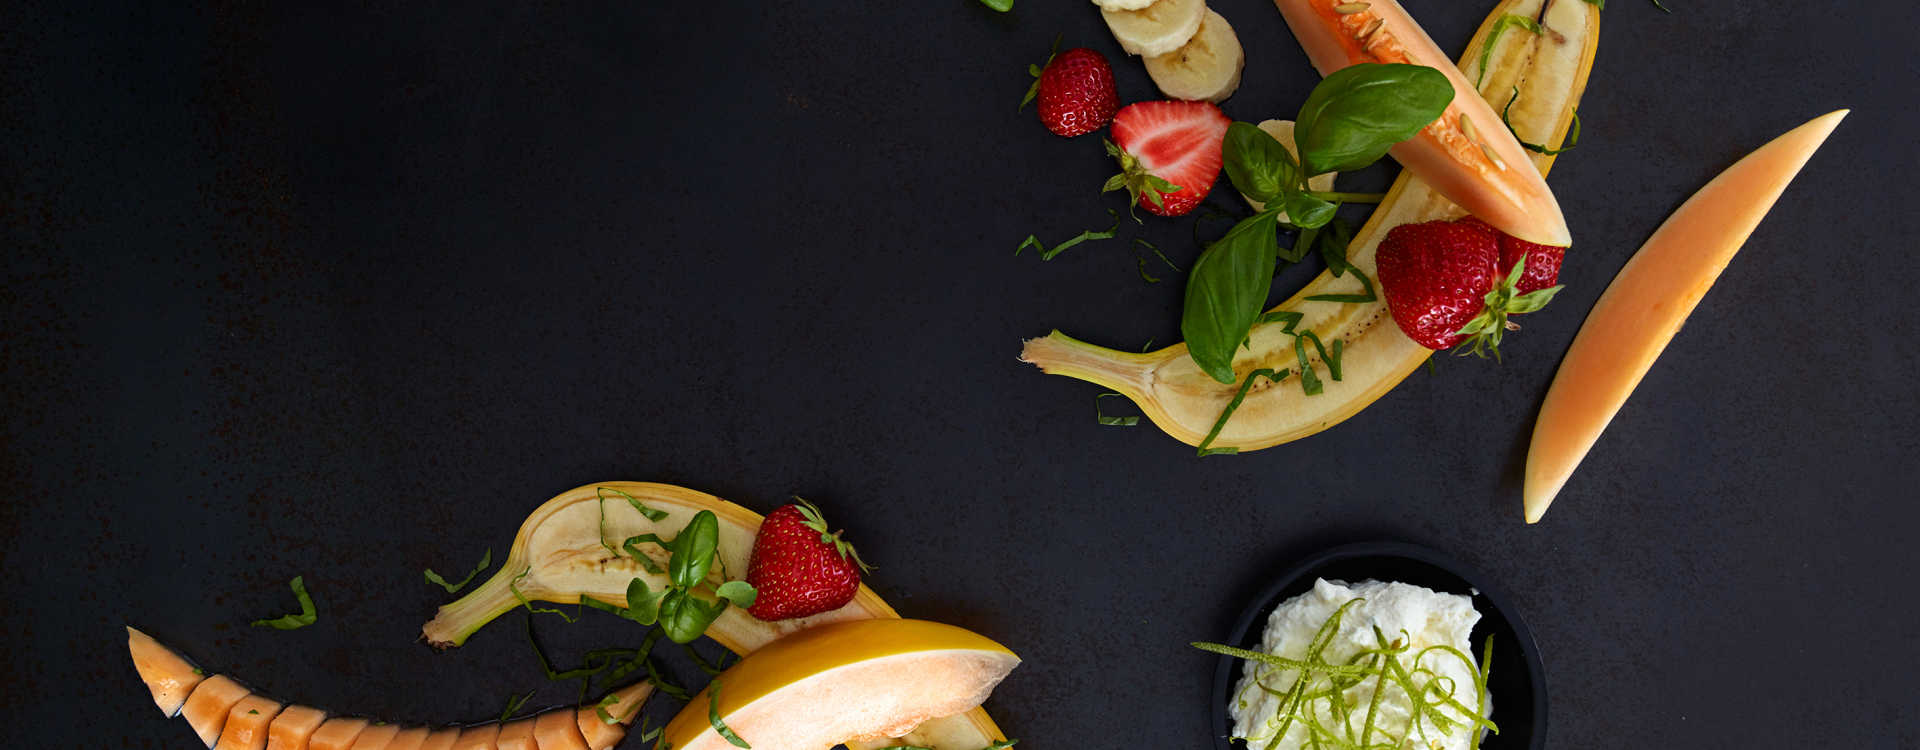 Melon-, banan- og jordbærsalat med limekrem og basilikum